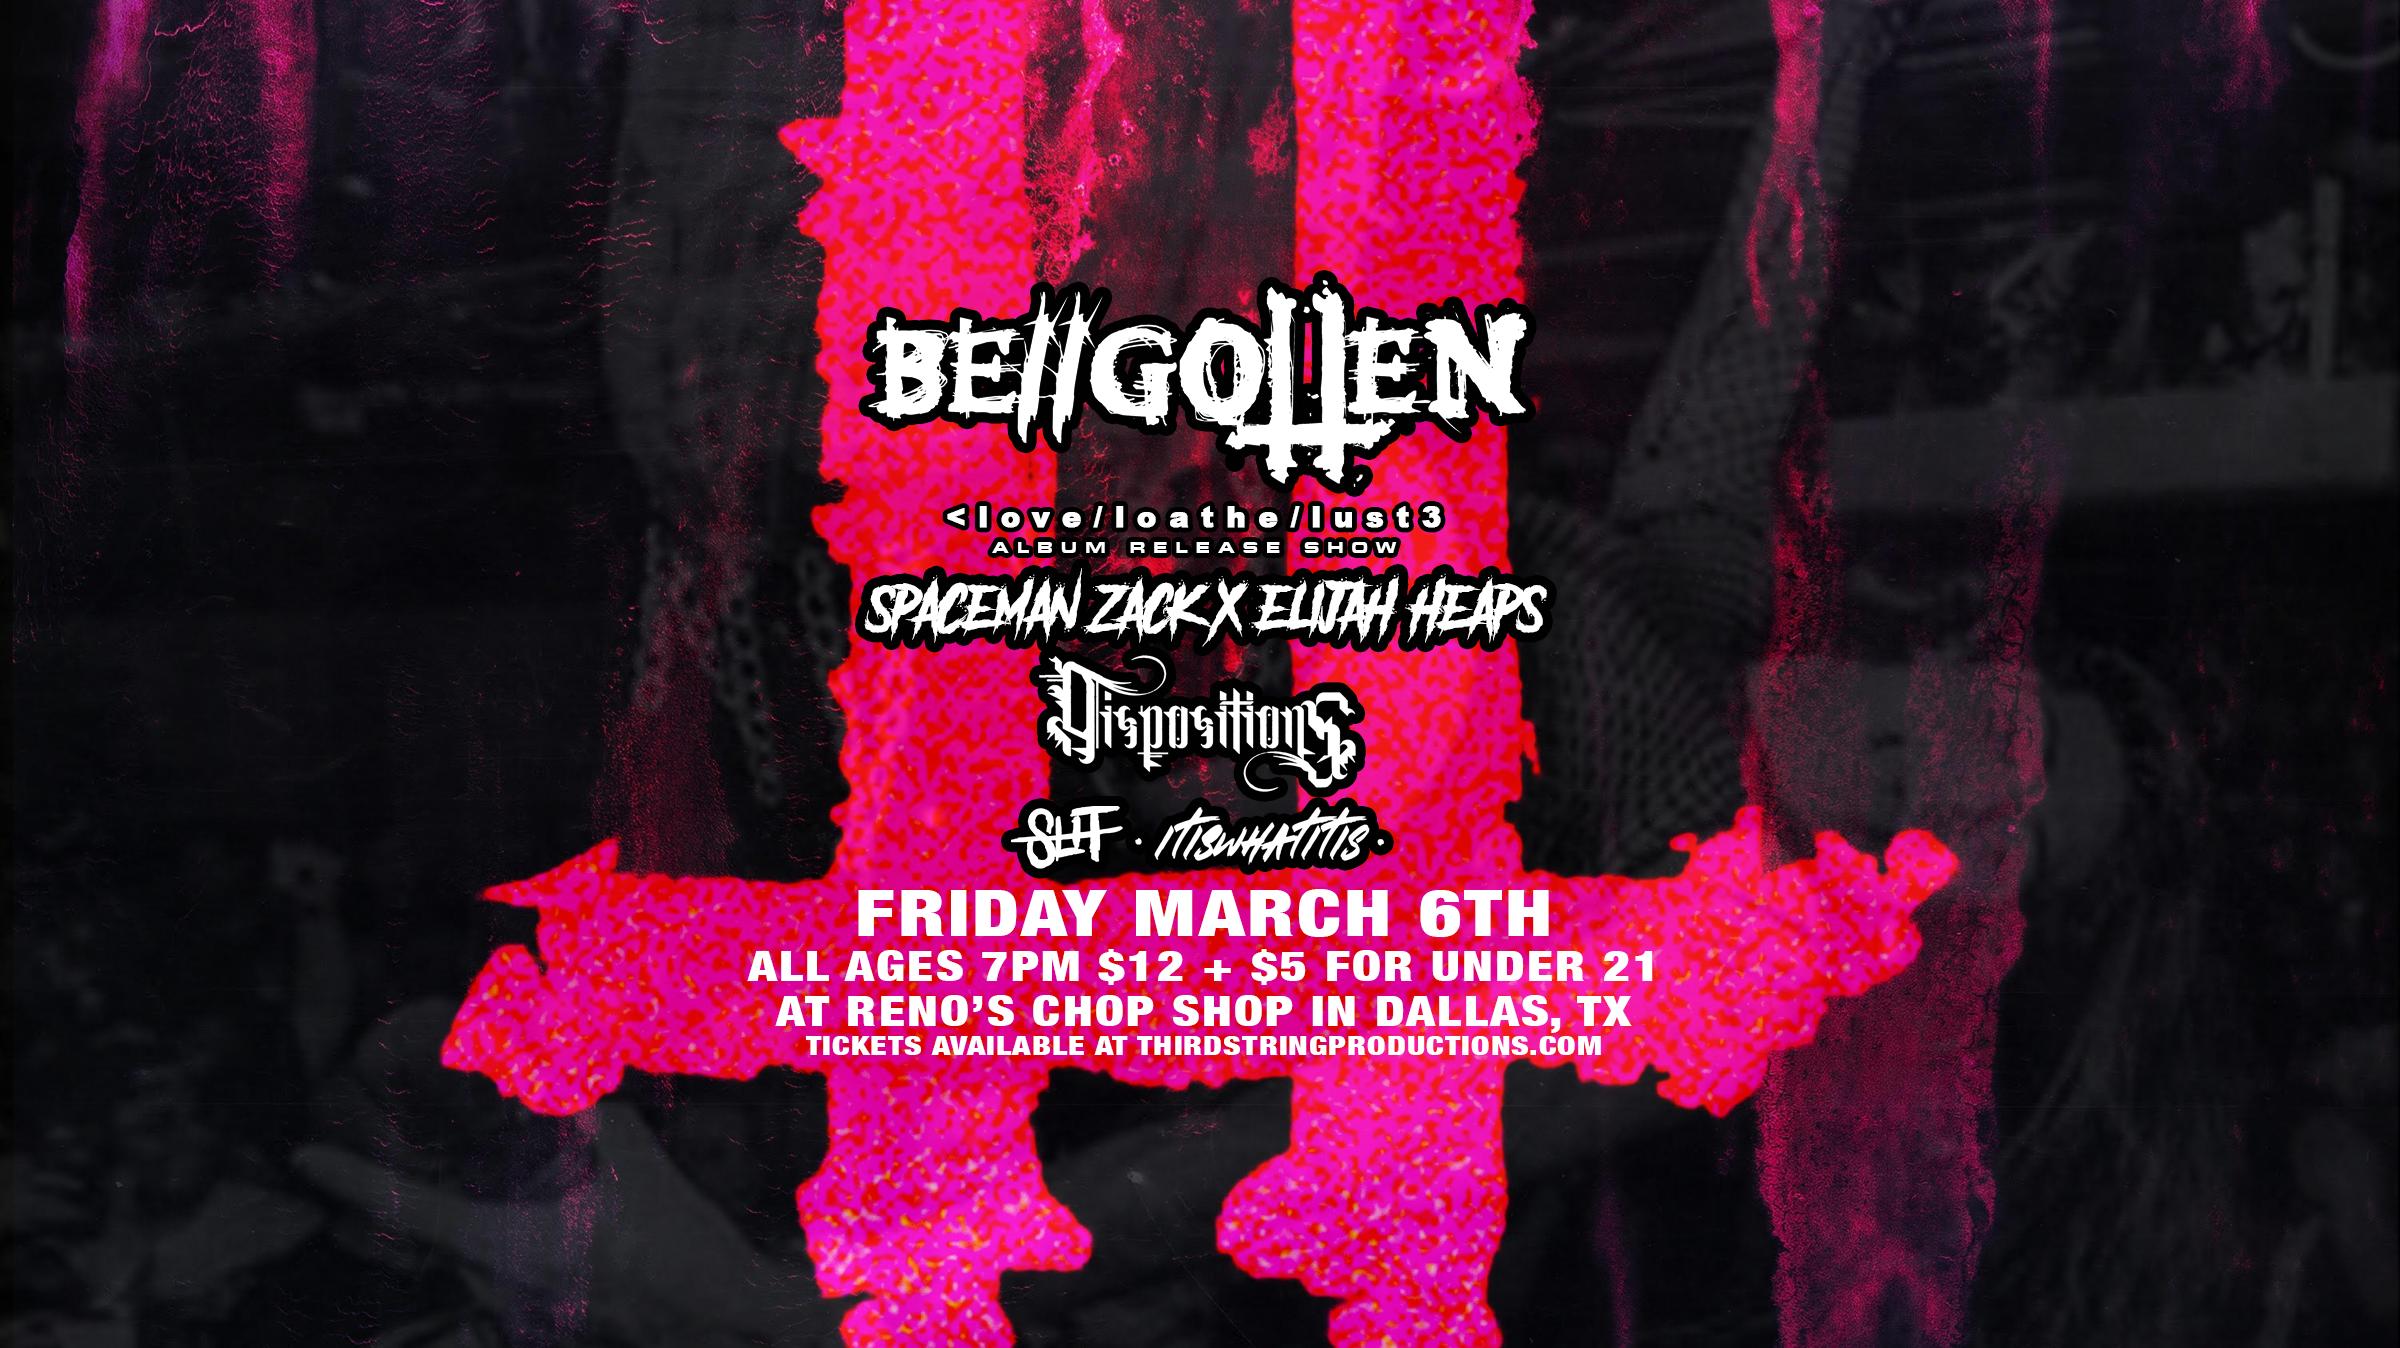 Be//Gotten Album Release Show at Renos Chop Shop!